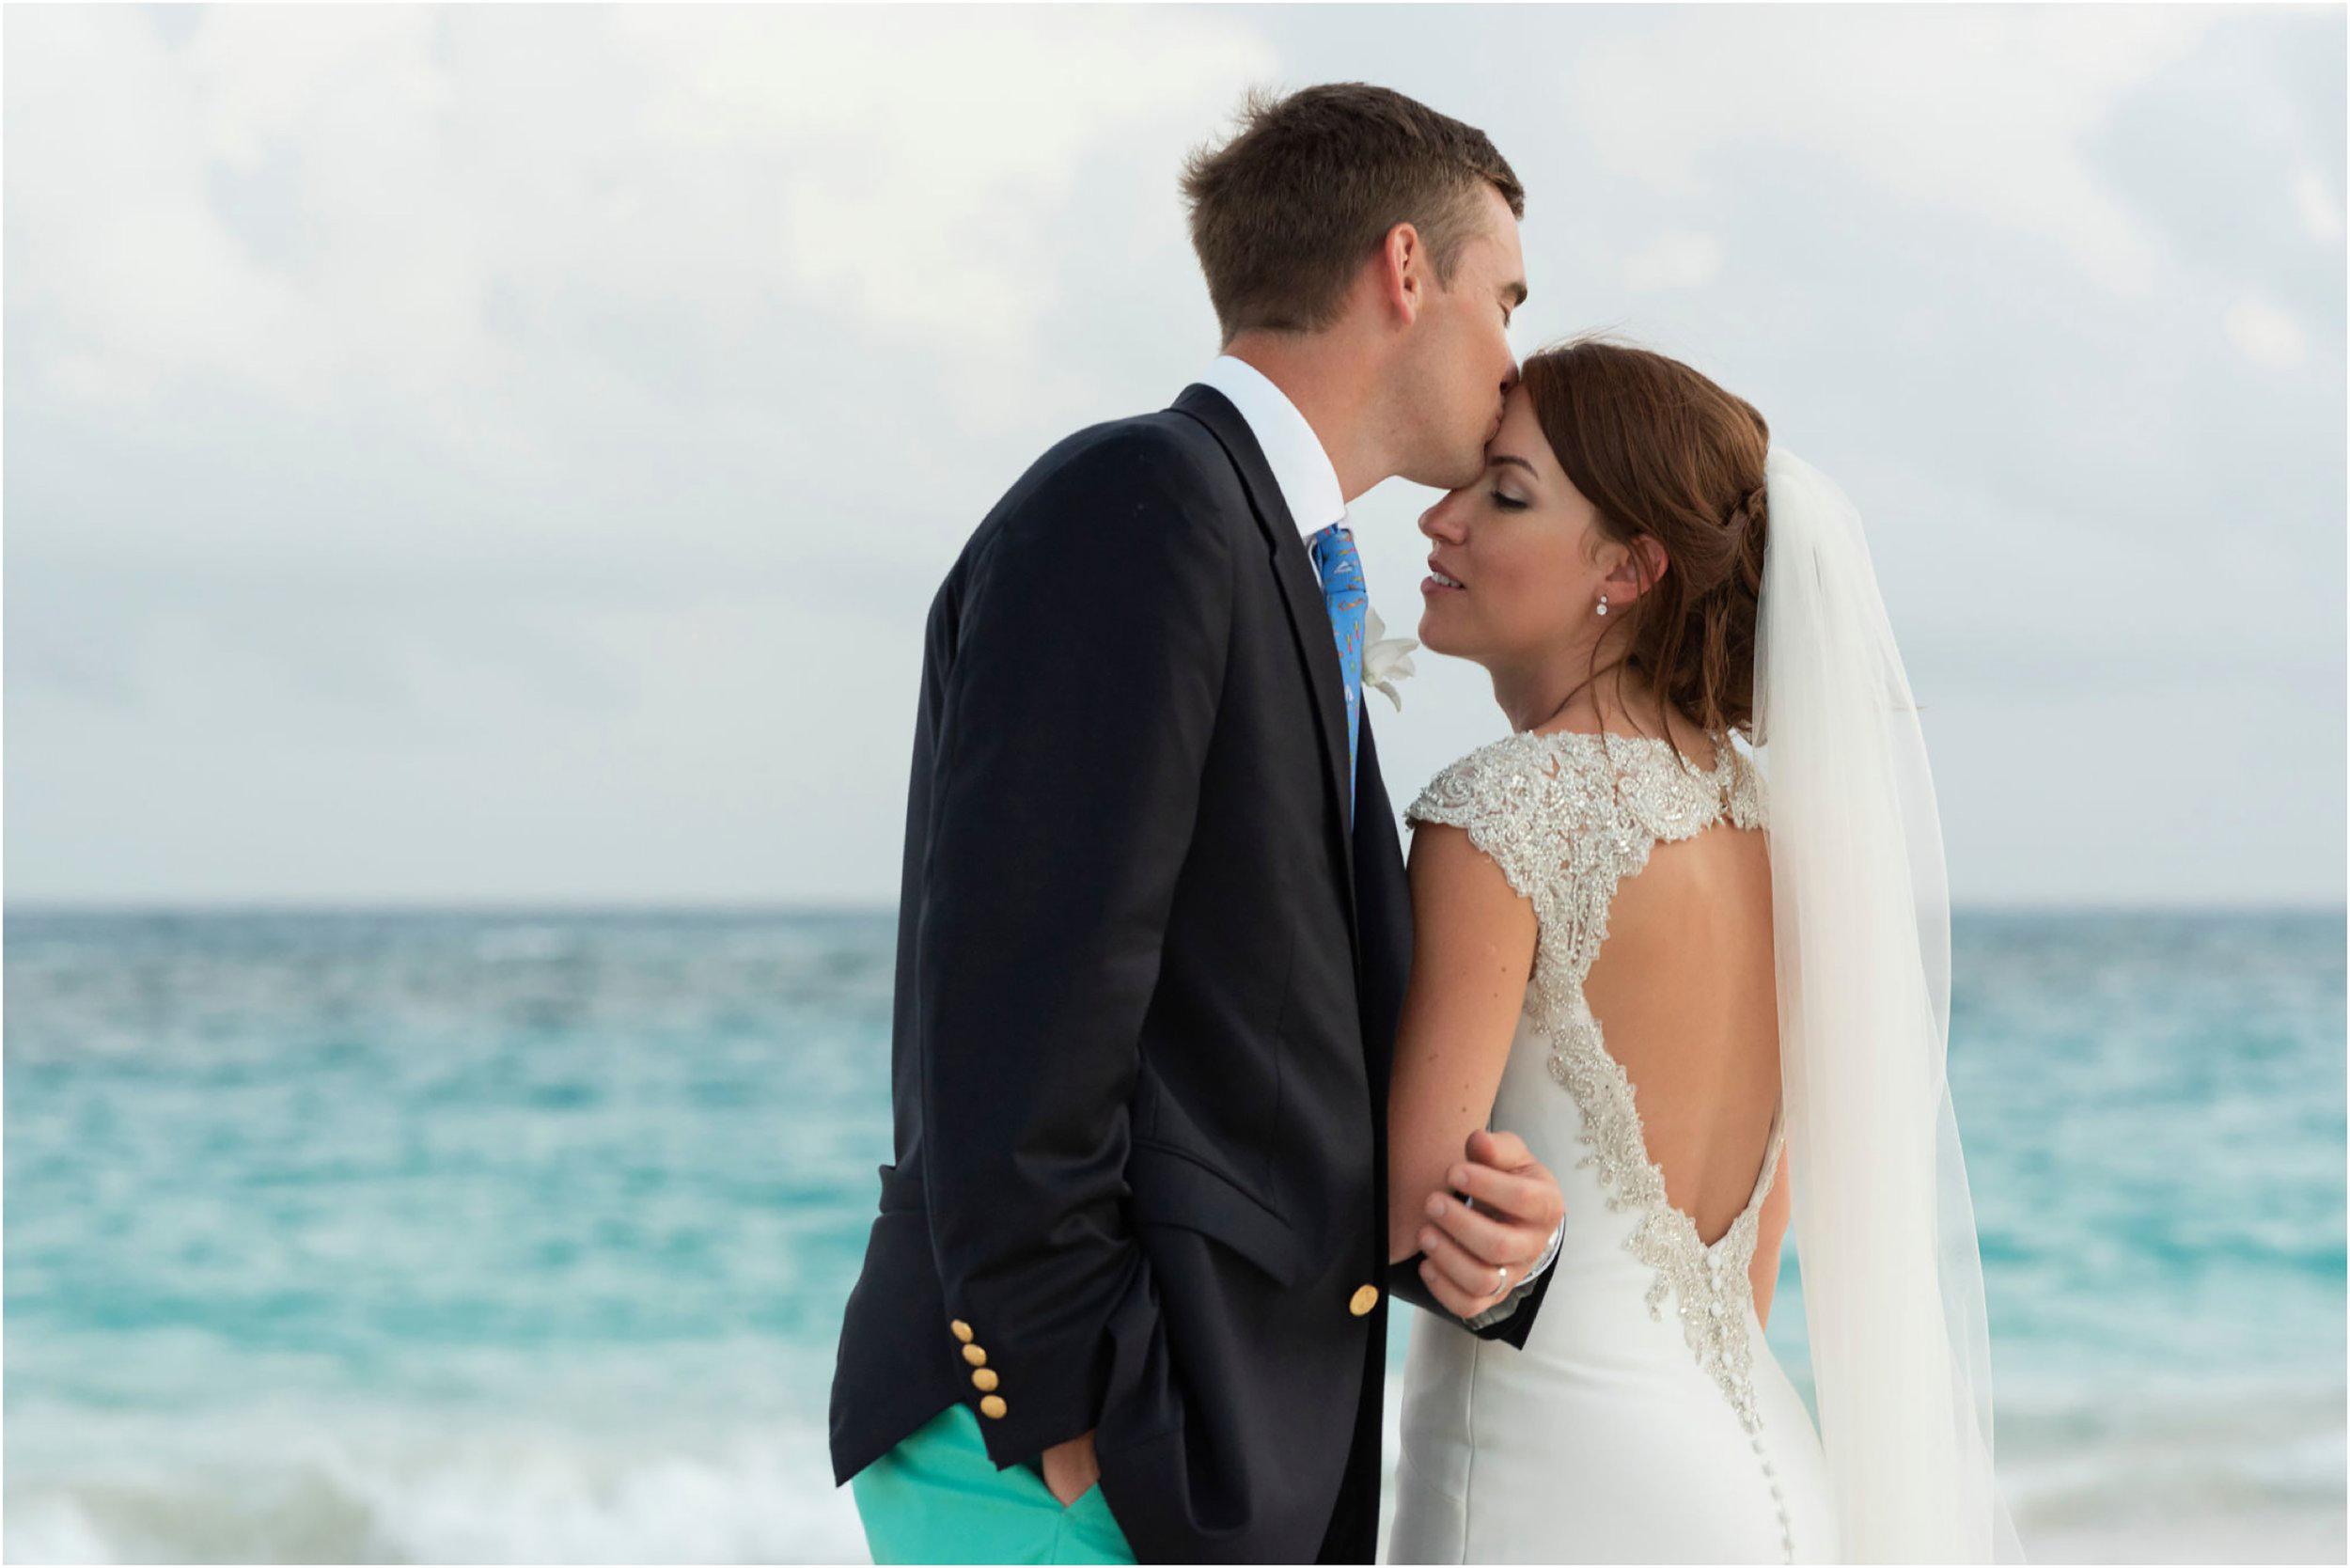 ©FianderFoto_Bermuda Wedding Photographer_Mid Ocean_Rachel_Angus_075.jpg